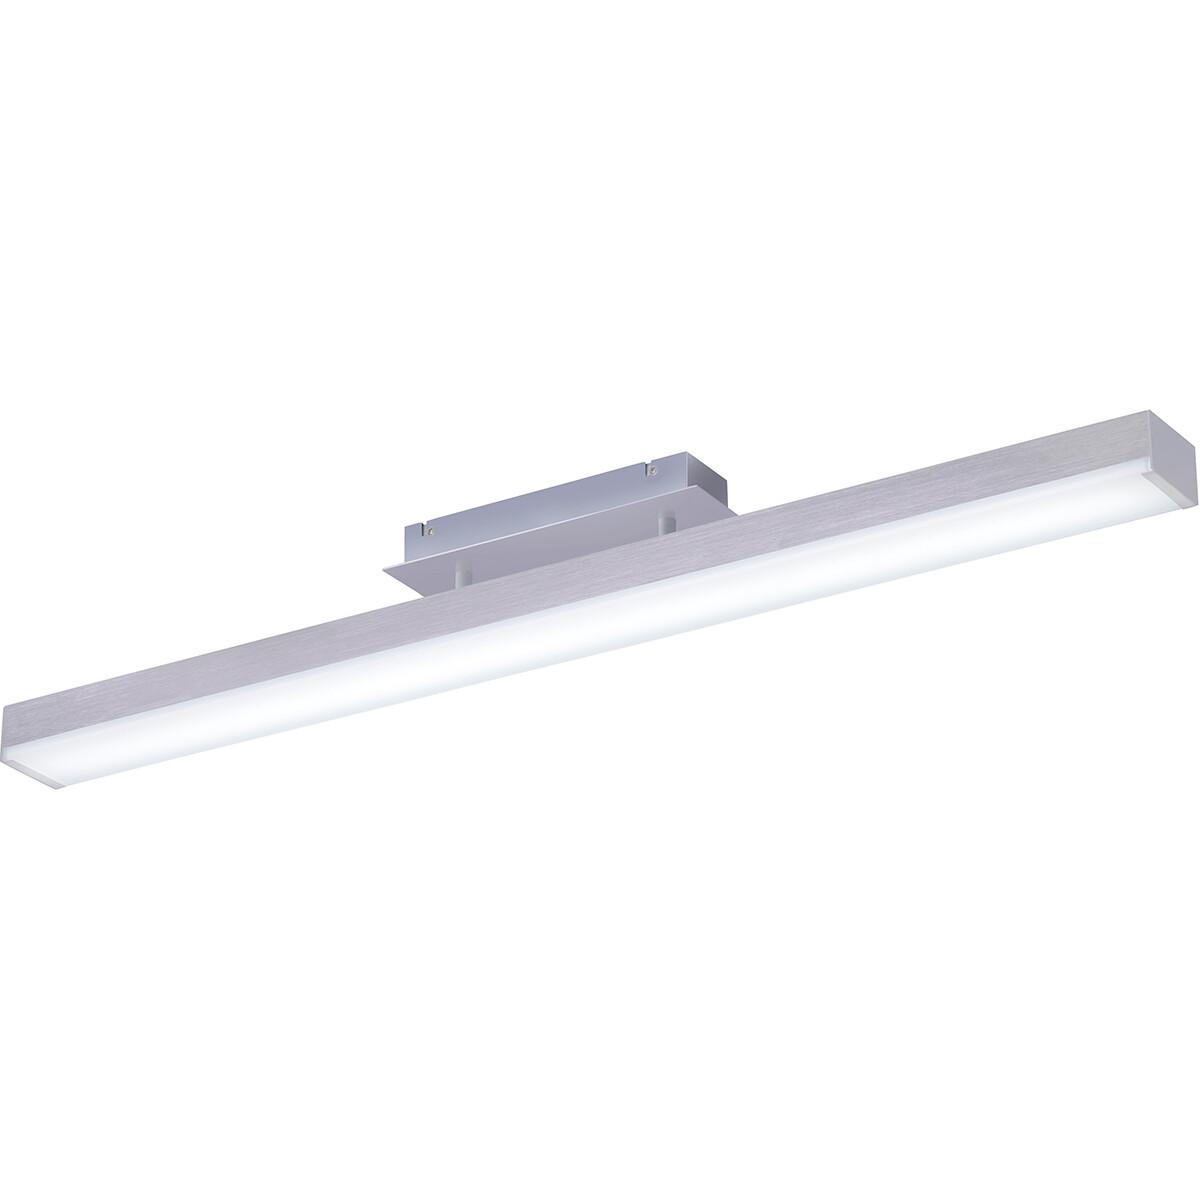 LED Plafondlamp WiZ - Smart LED - Plafondverlichting - Trion Lavar - 20W - Aanpasbare Kleur - RGBW -